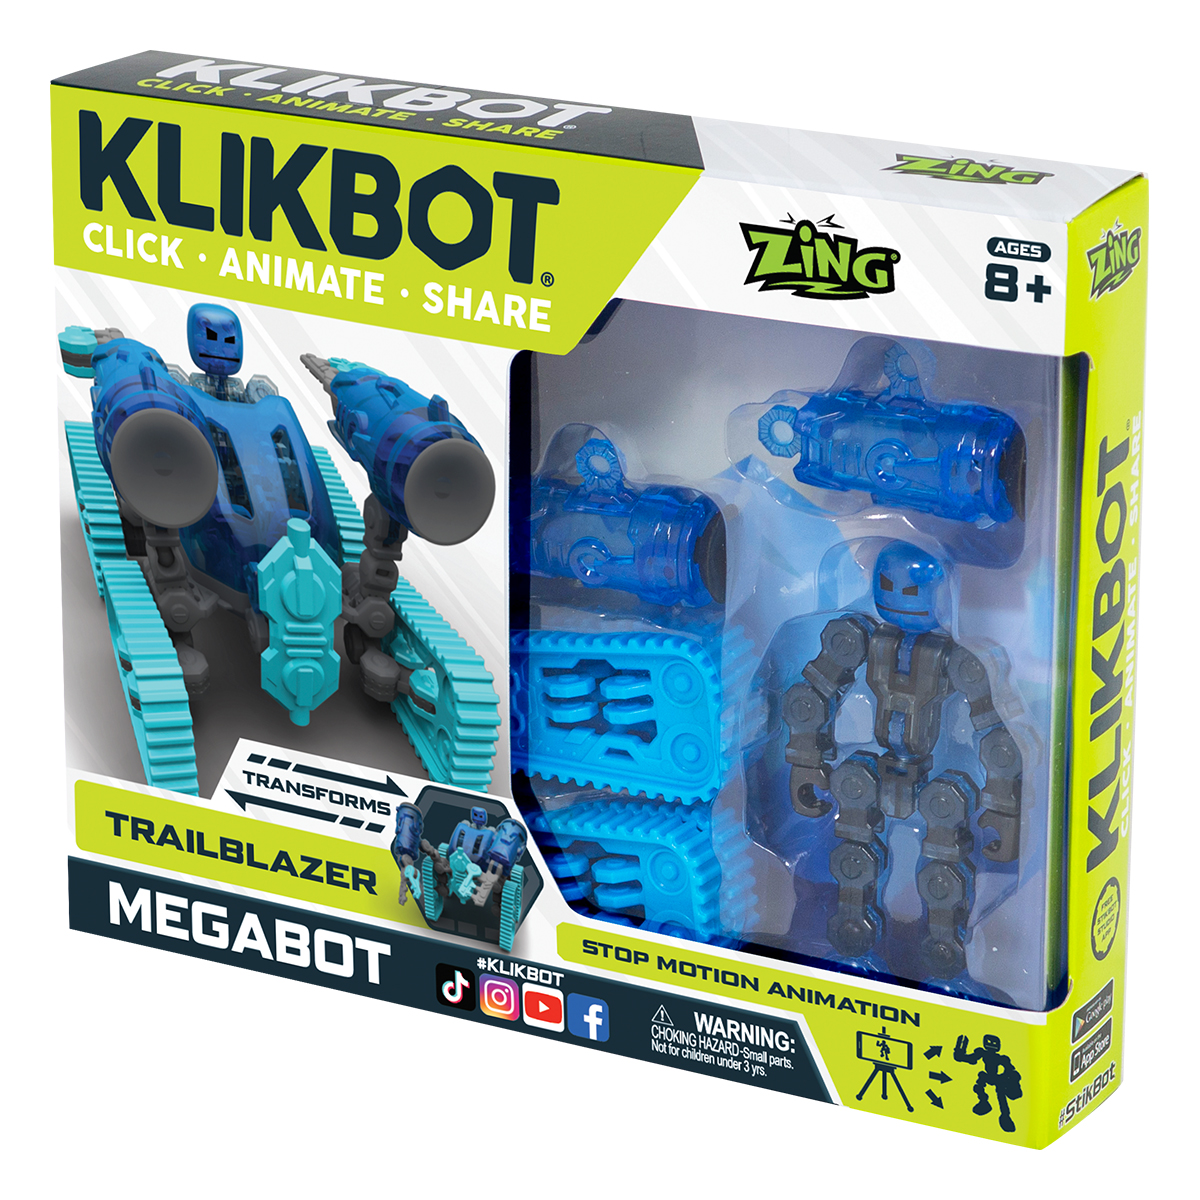 Set Figurina Robot articulat transformabil KlikBot Megabots Trailblazer, Blue